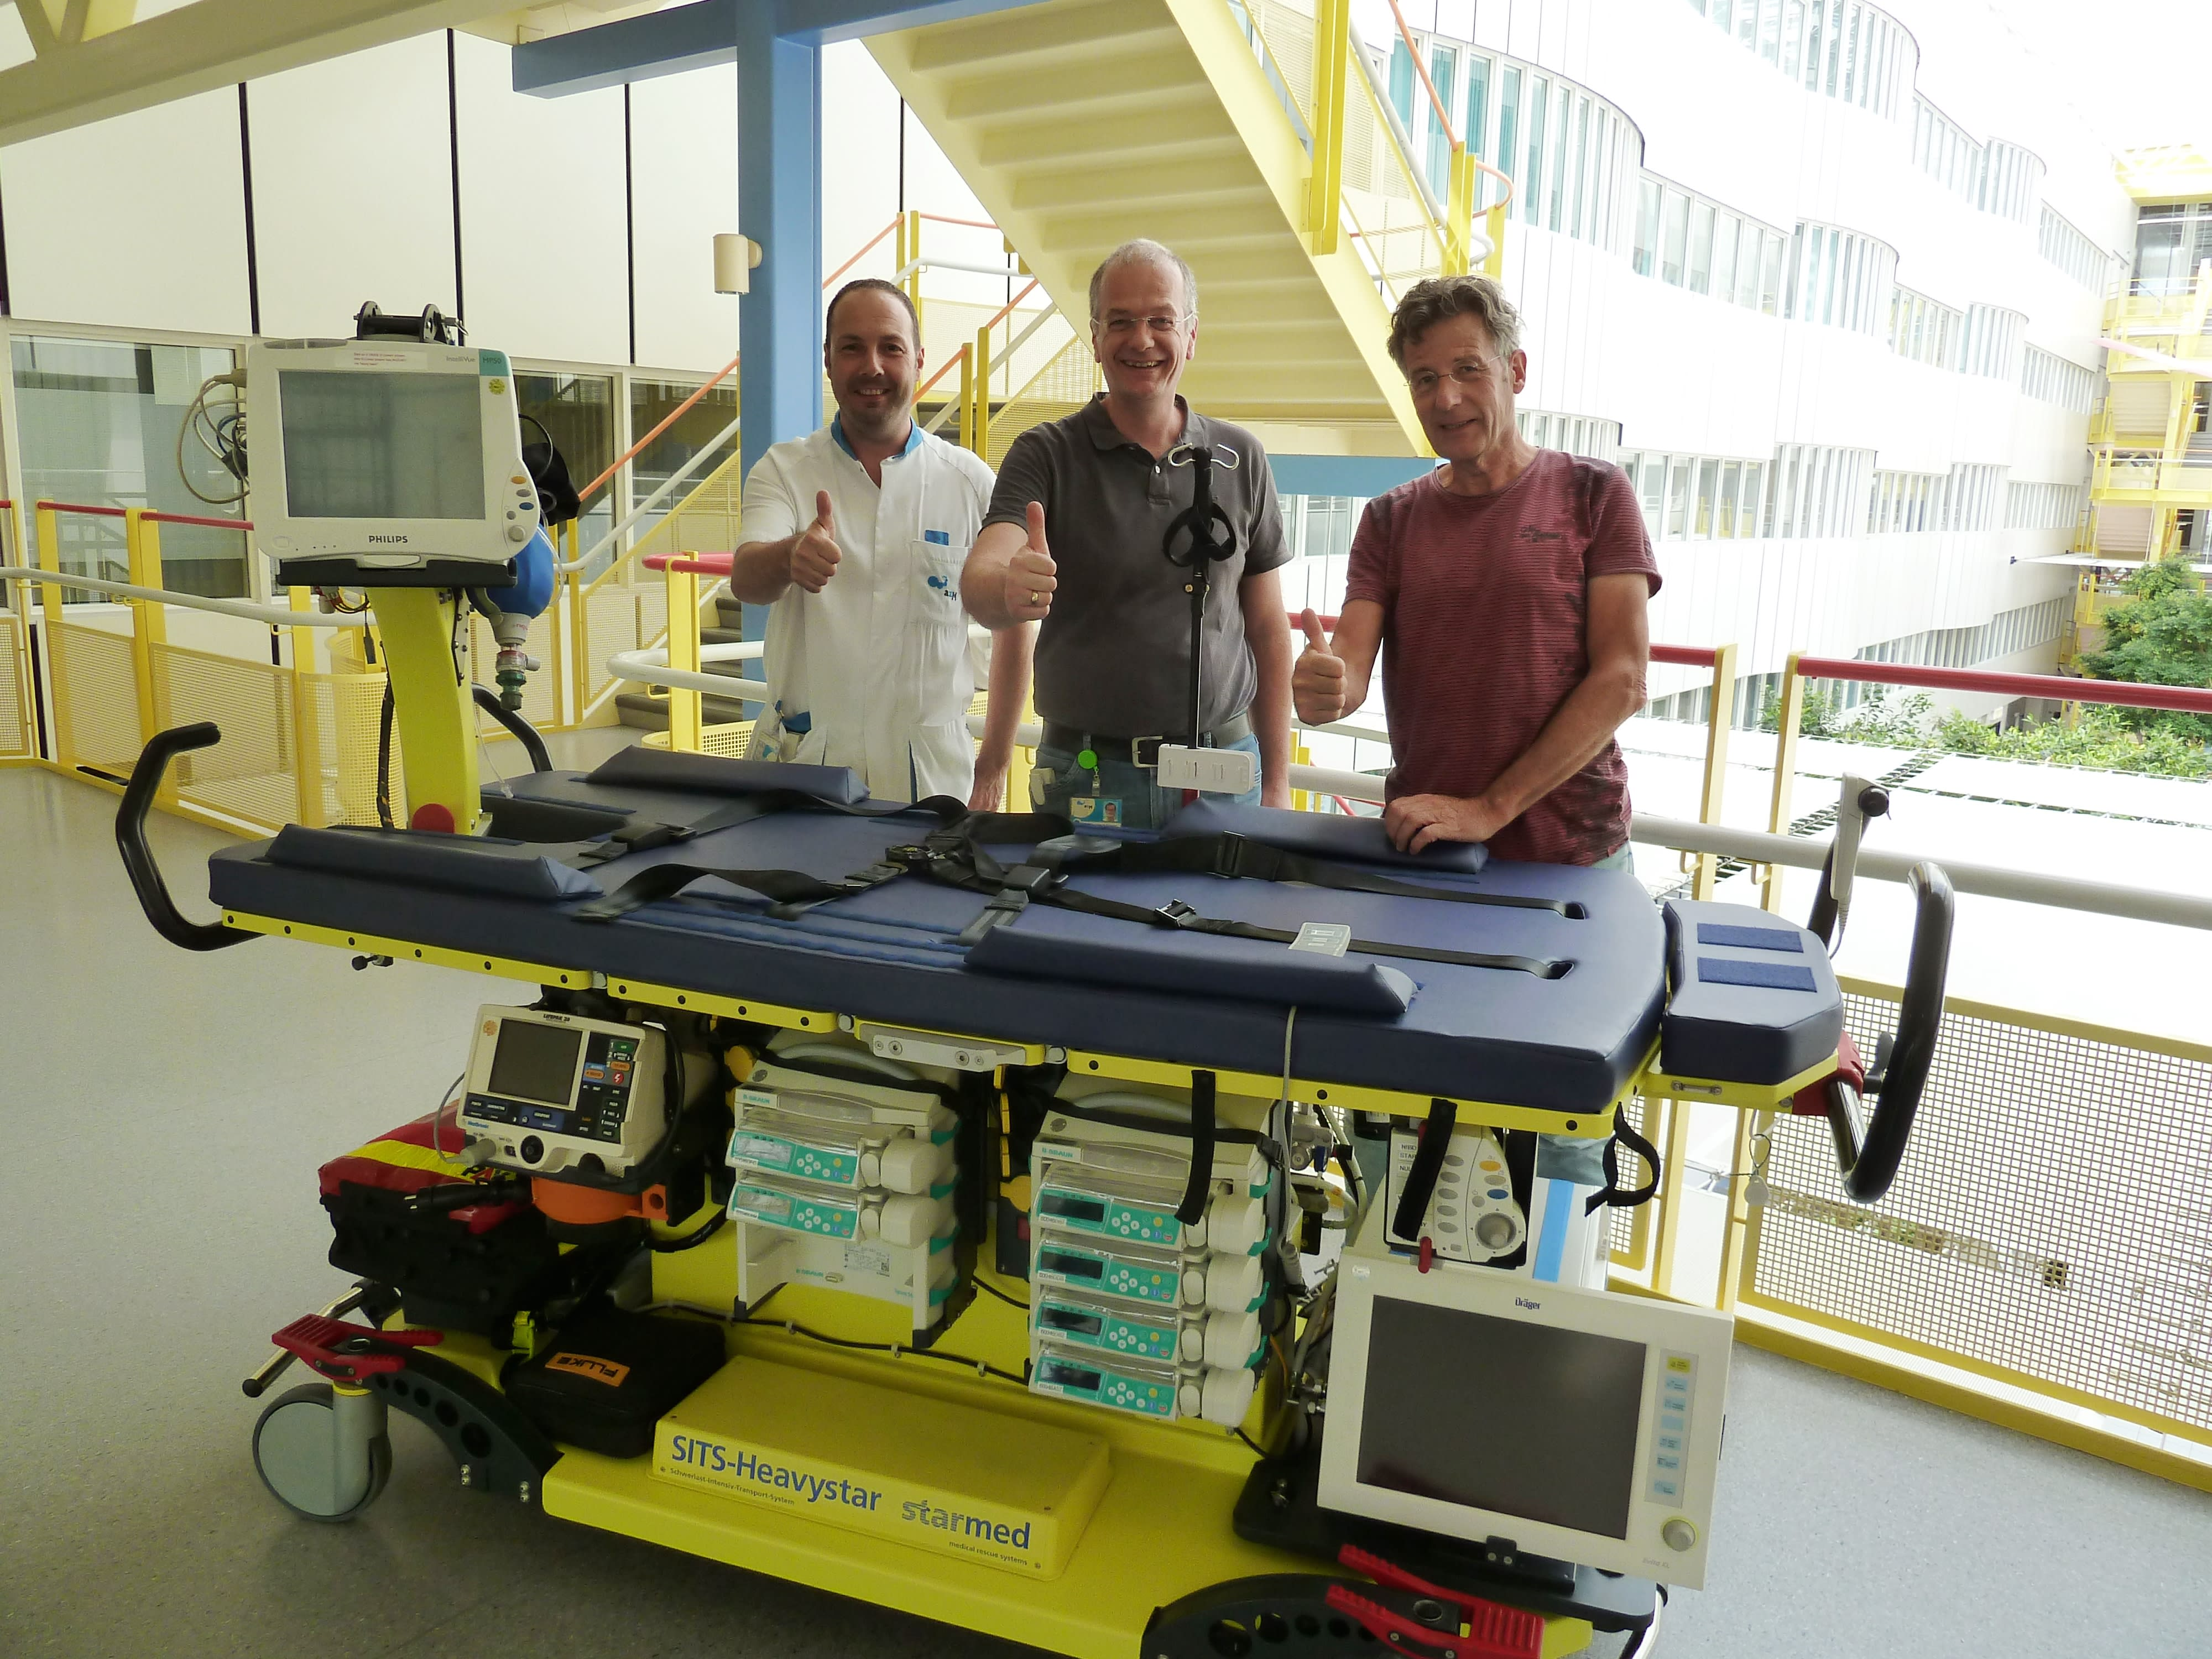 UMC Maastricht 3 Herren hinter Transportmittel